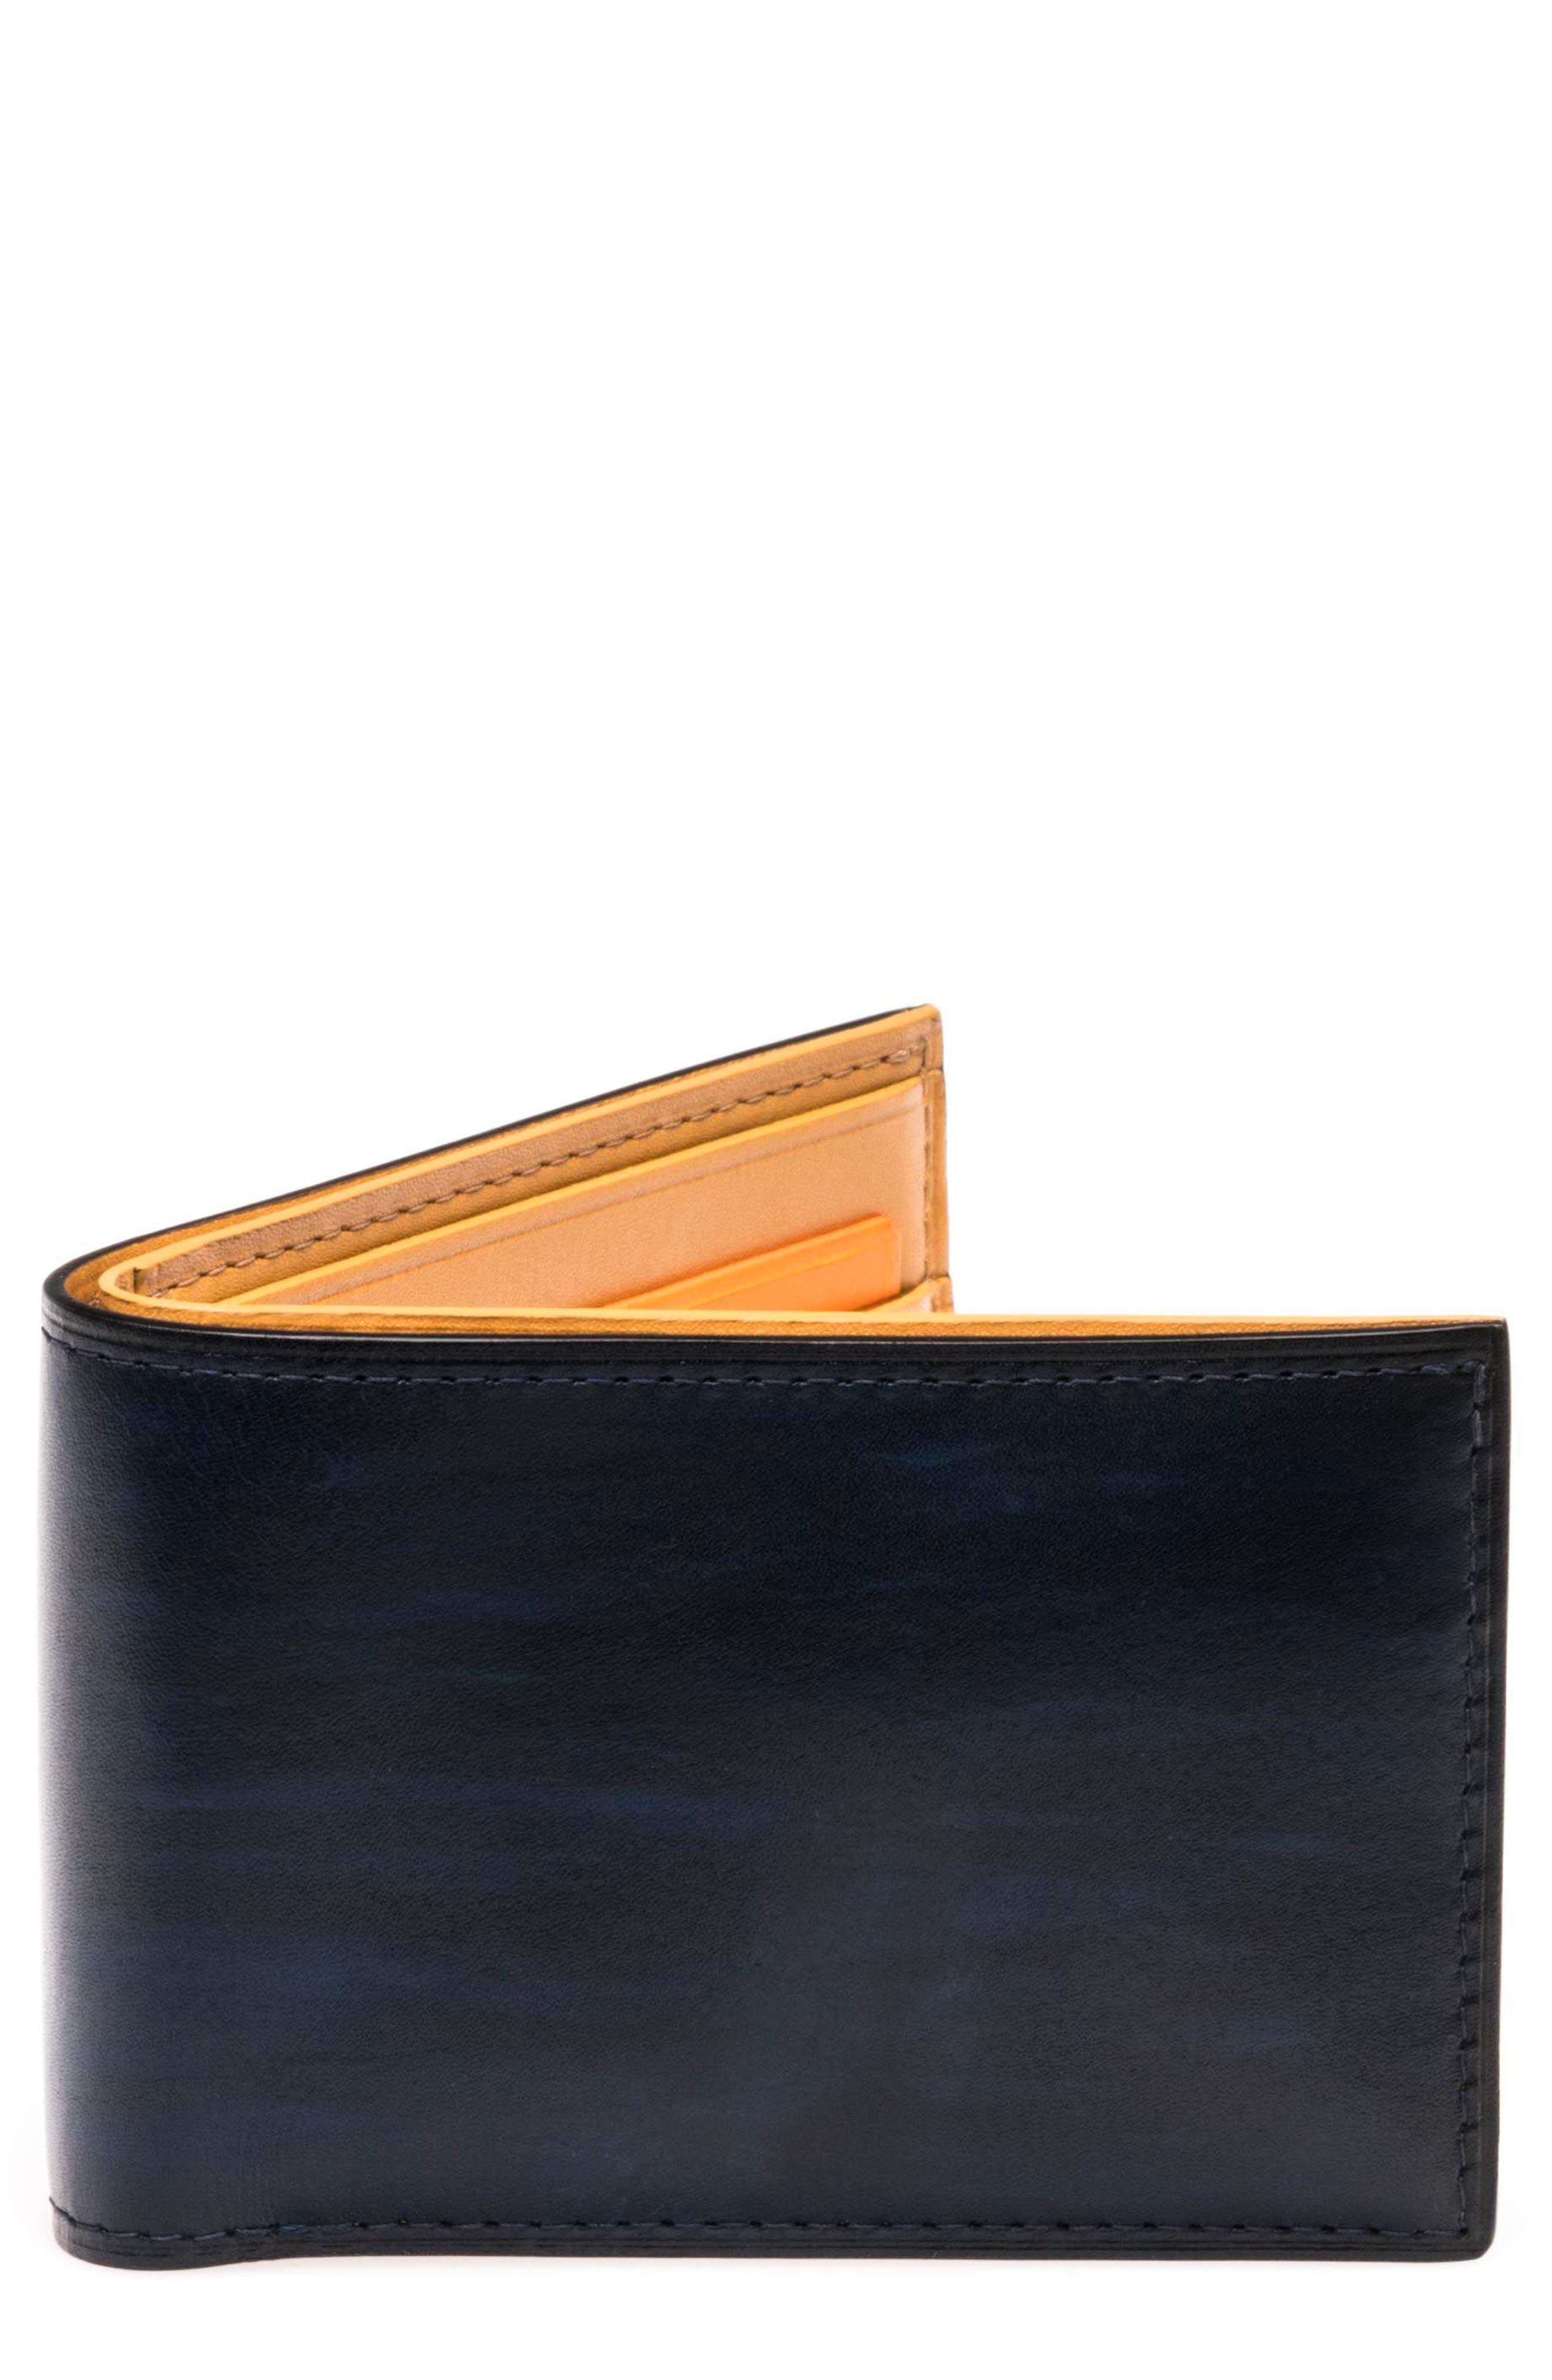 Alternate Image 1 Selected - Magnanni Slim Leather Bifold Wallet